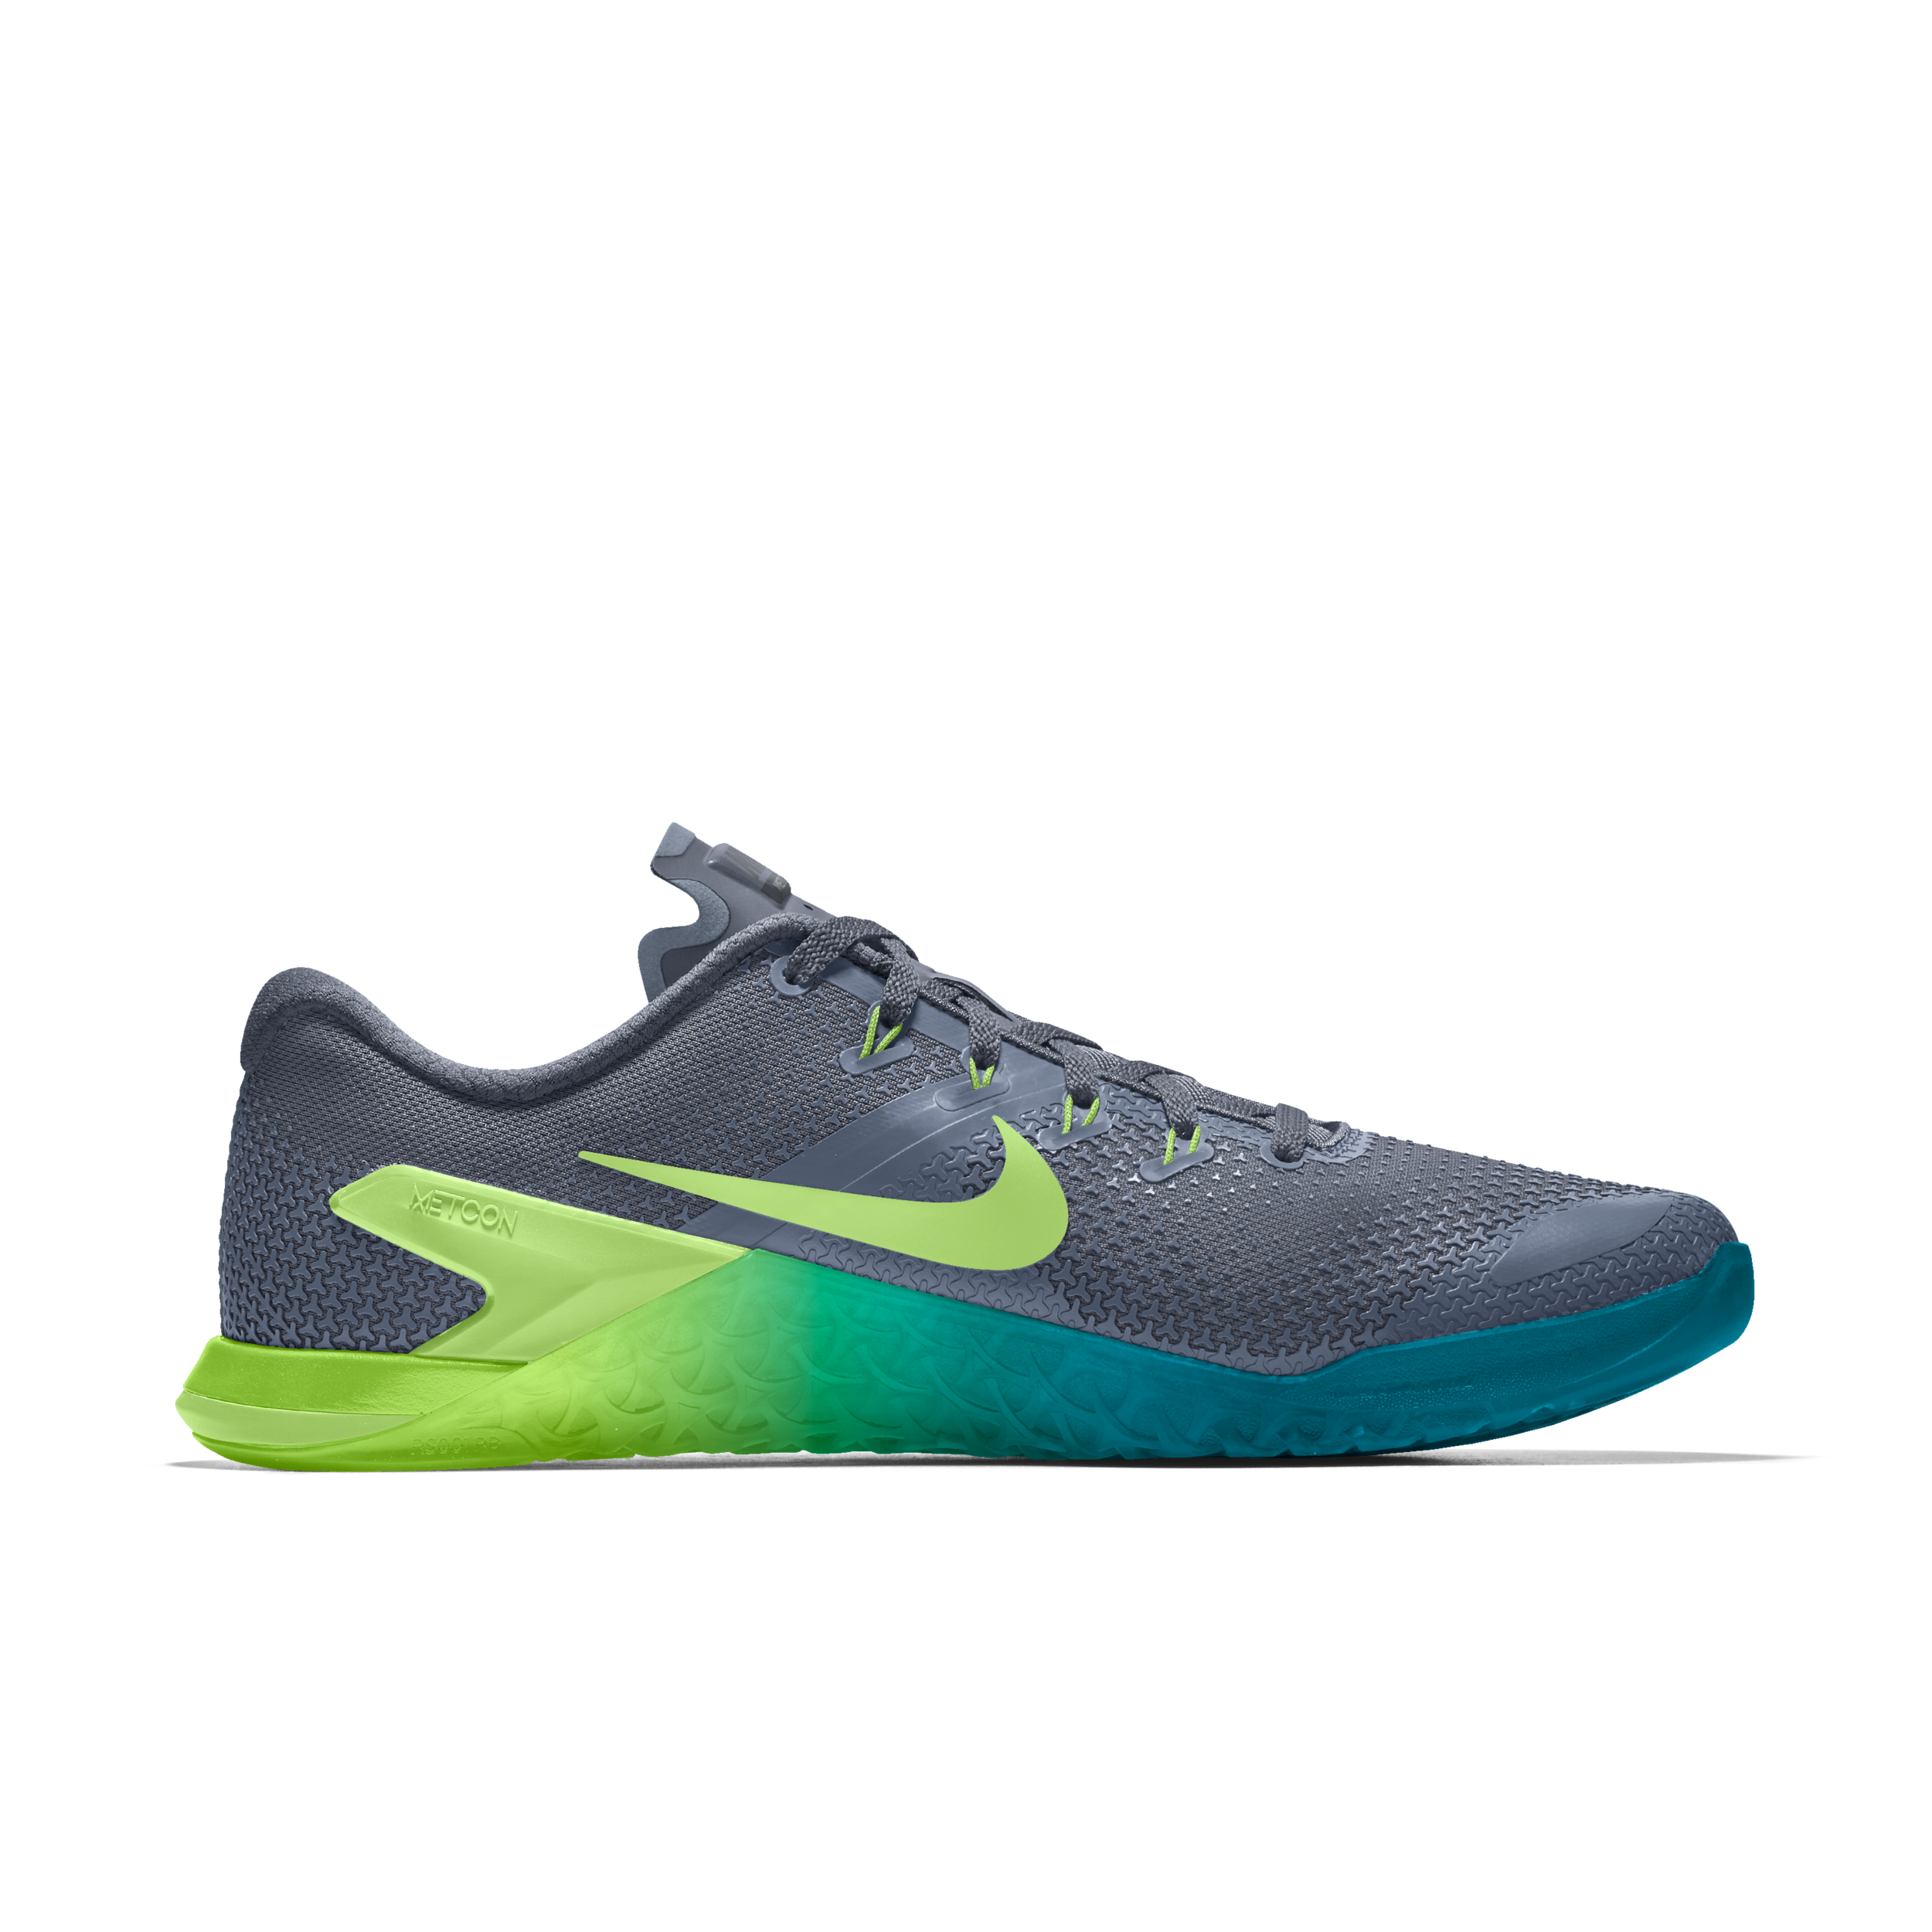 new style 3b585 1582c Nike Metcon 4 iD edzőcipő. Nike.com HU Presents For Men, Guy Gifts